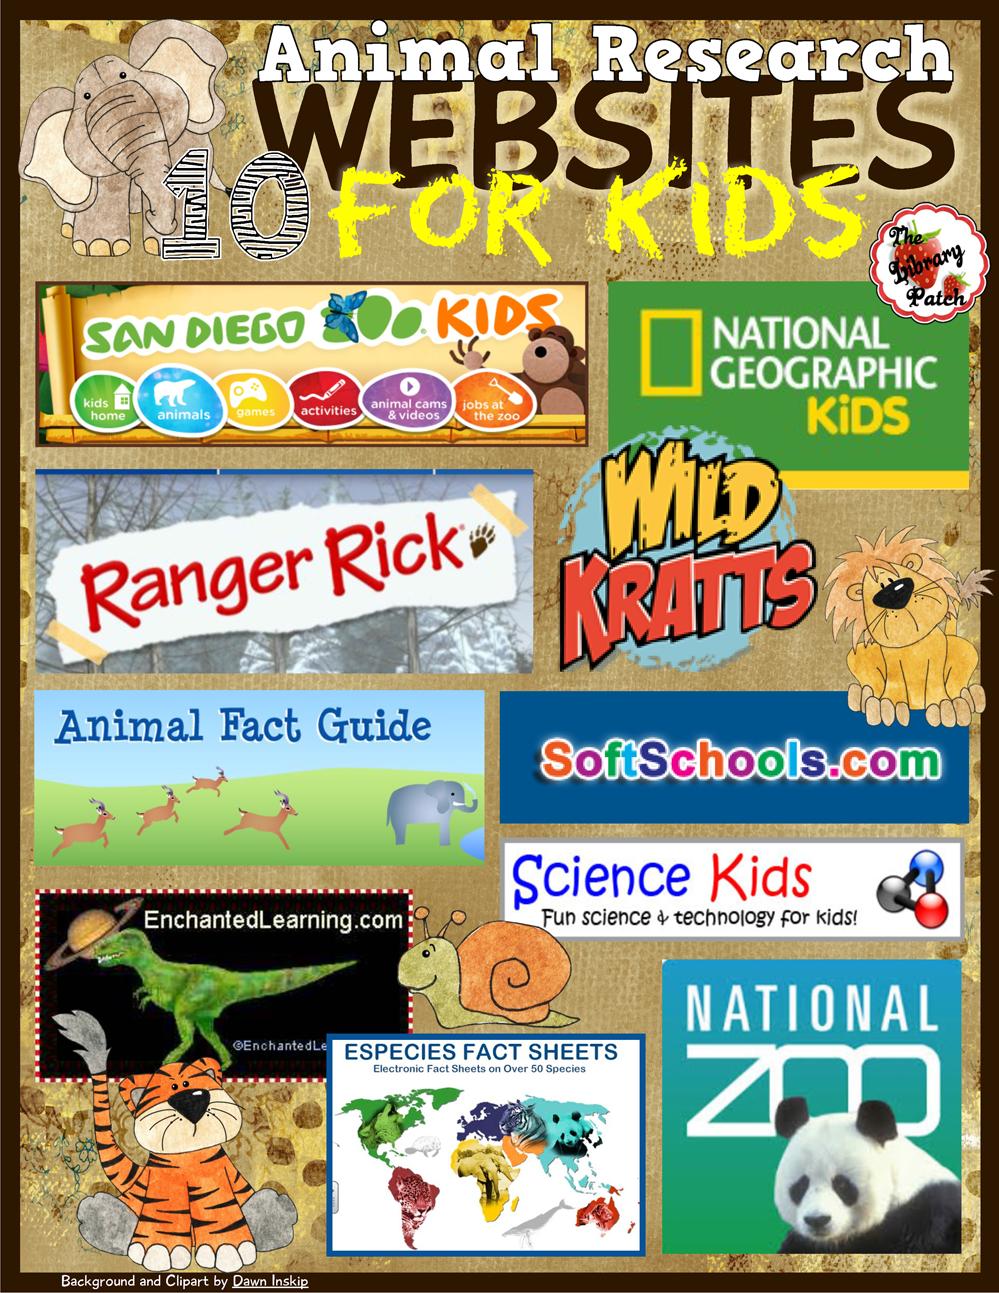 https://www.teacherspayteachers.com/Product/Animal-Research-Websites-for-Kids-1641256